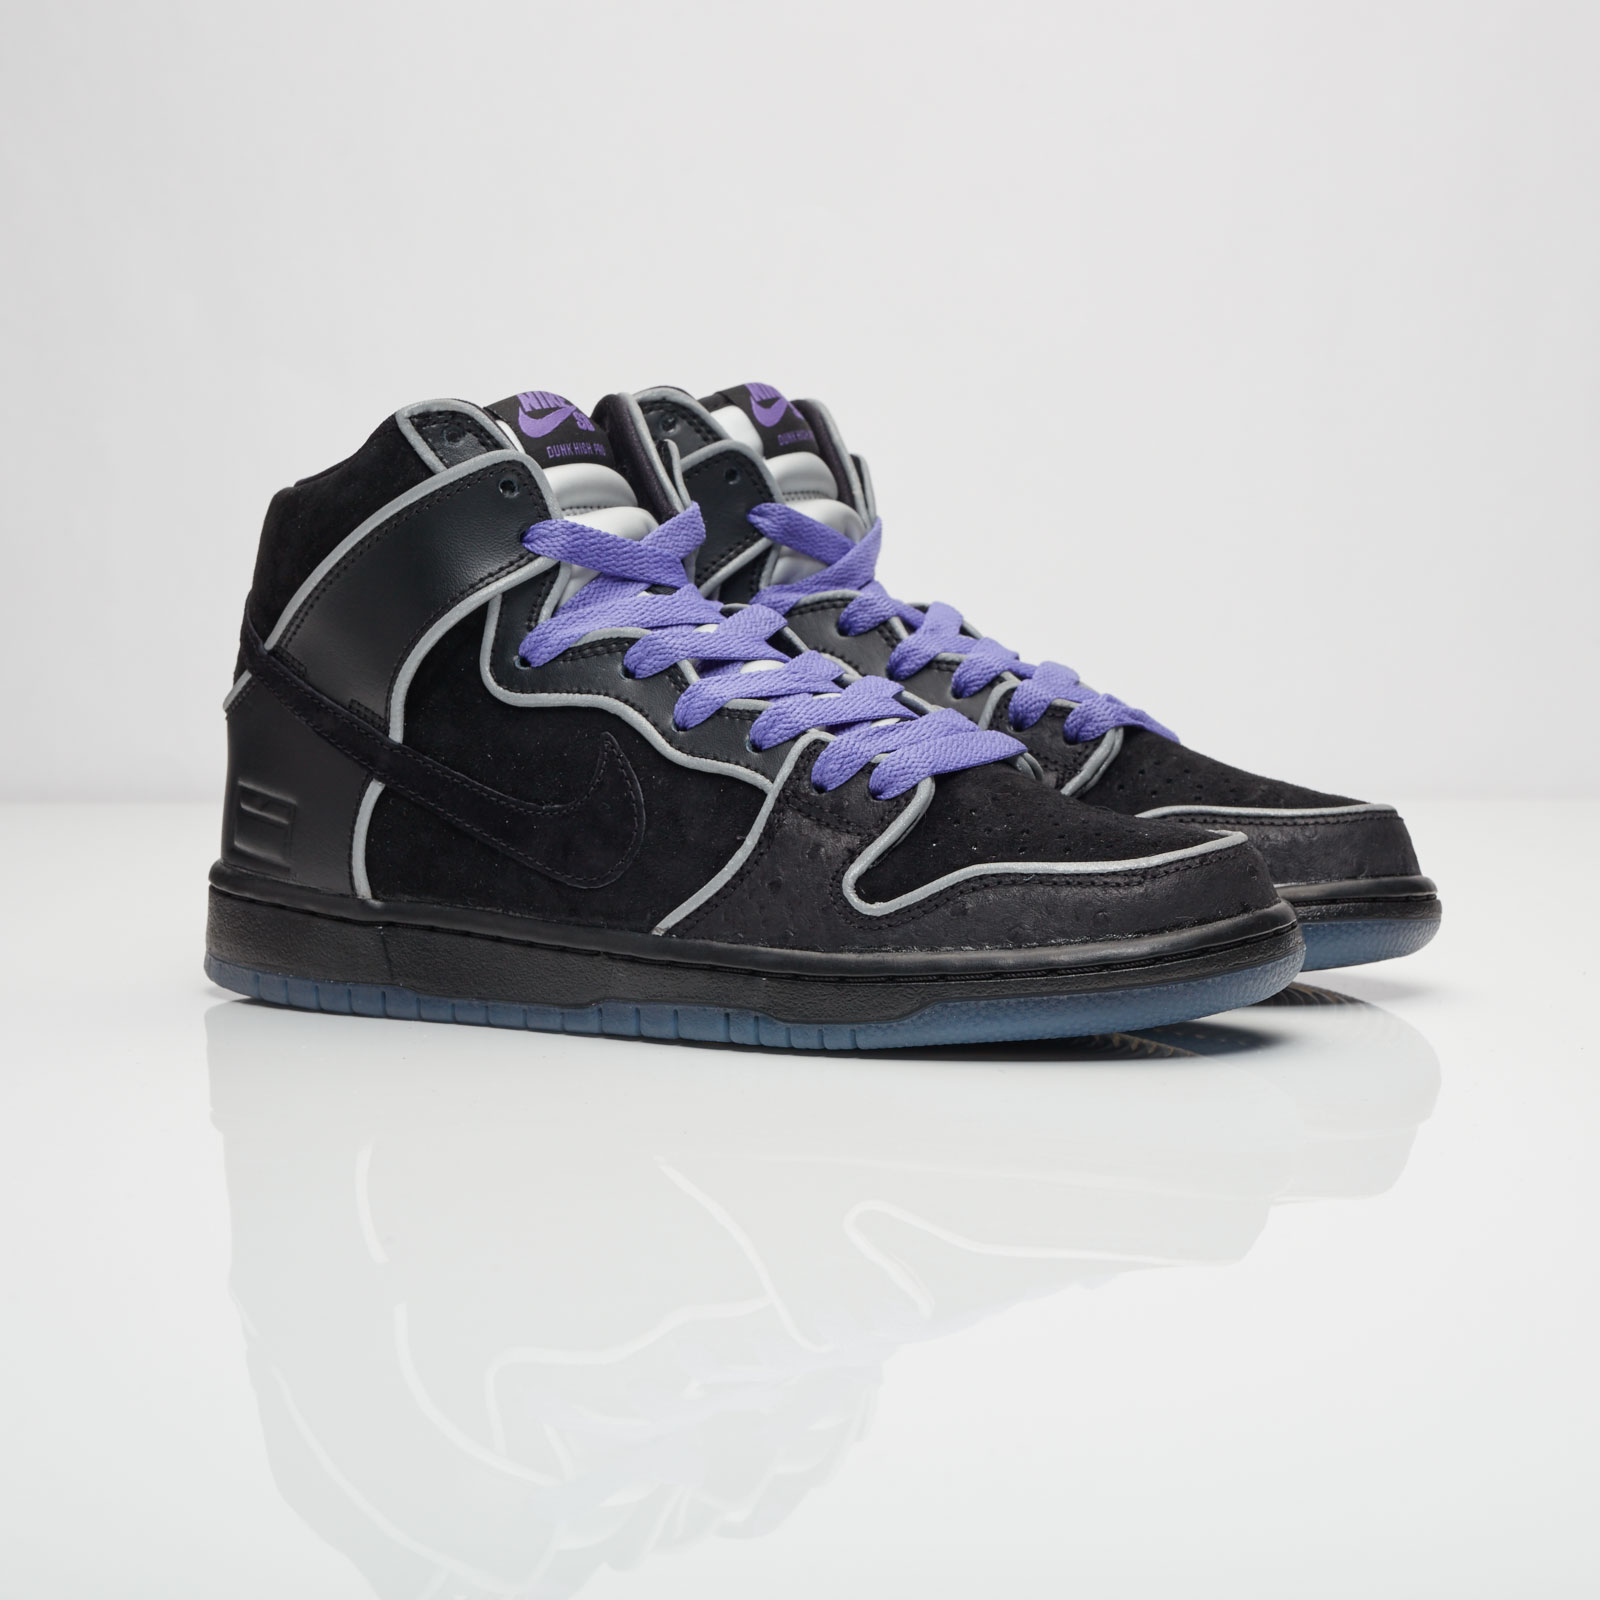 a6e5e21dde5 ... promo code for nike sb dunk high purple box 833456 002 mf doom 3822a  282ff